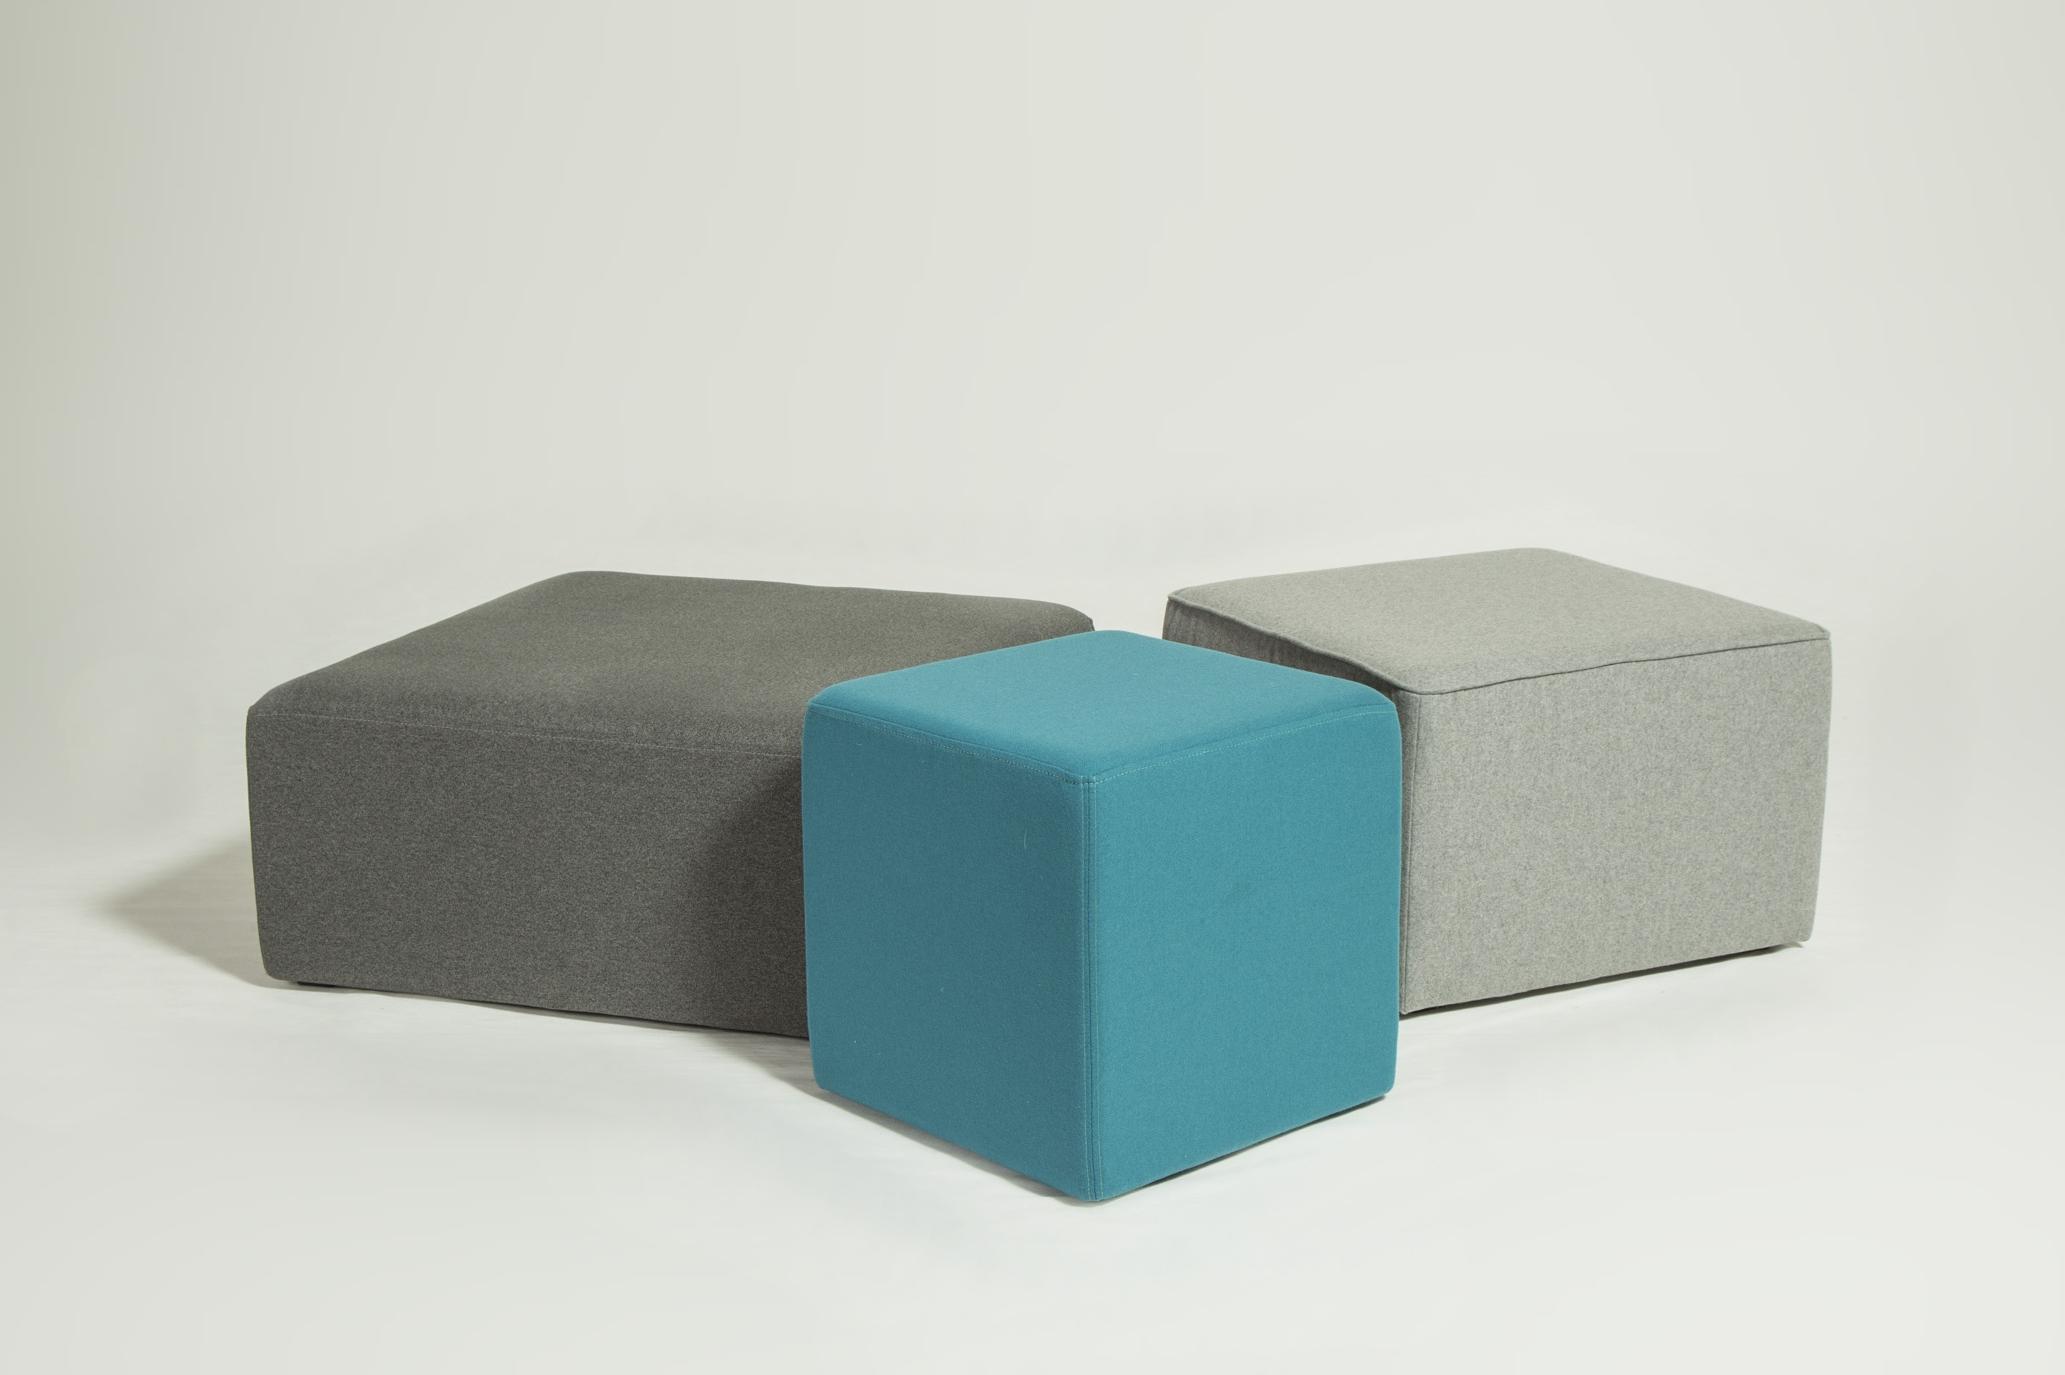 cube_10.jpg